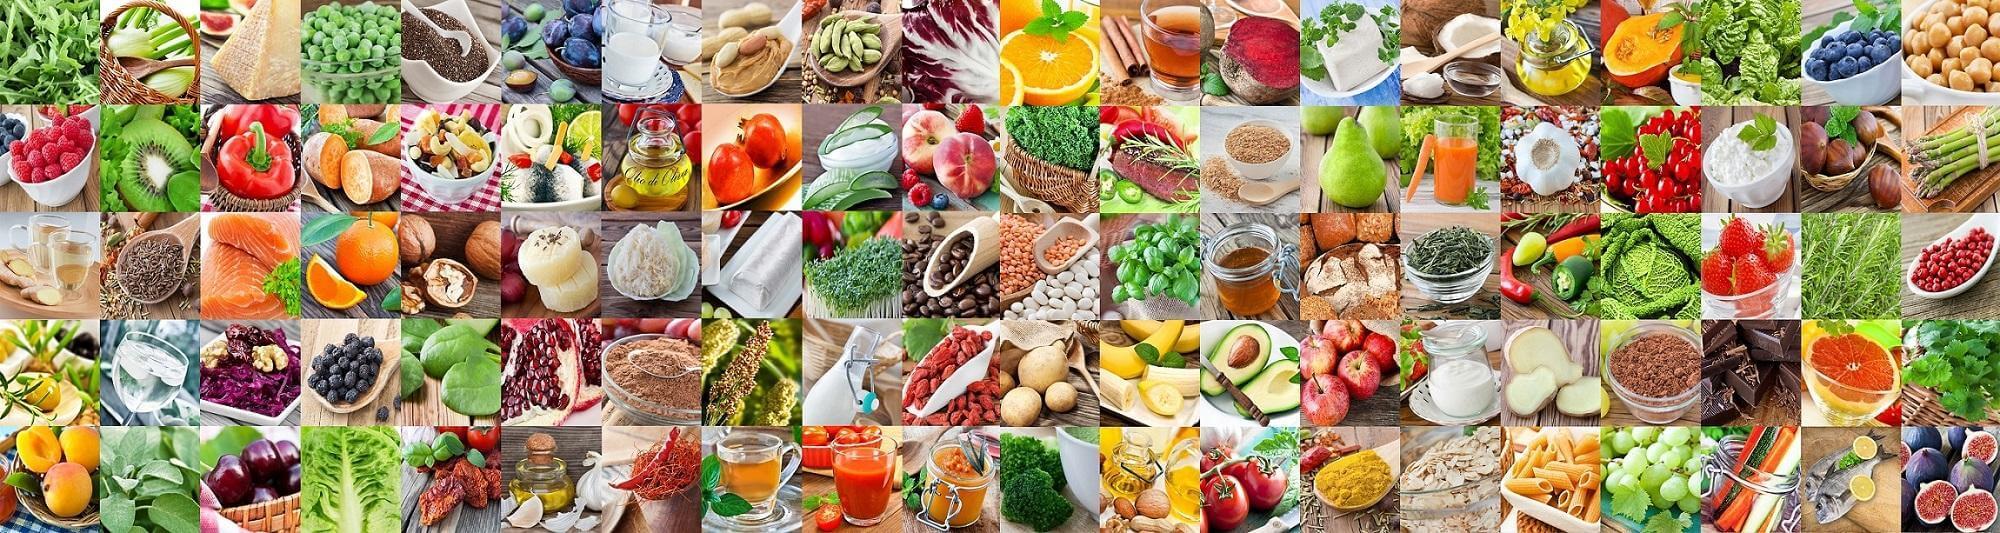 Nahrungsergänzung, gesunde Ernährung, Vitamine, Mineralien